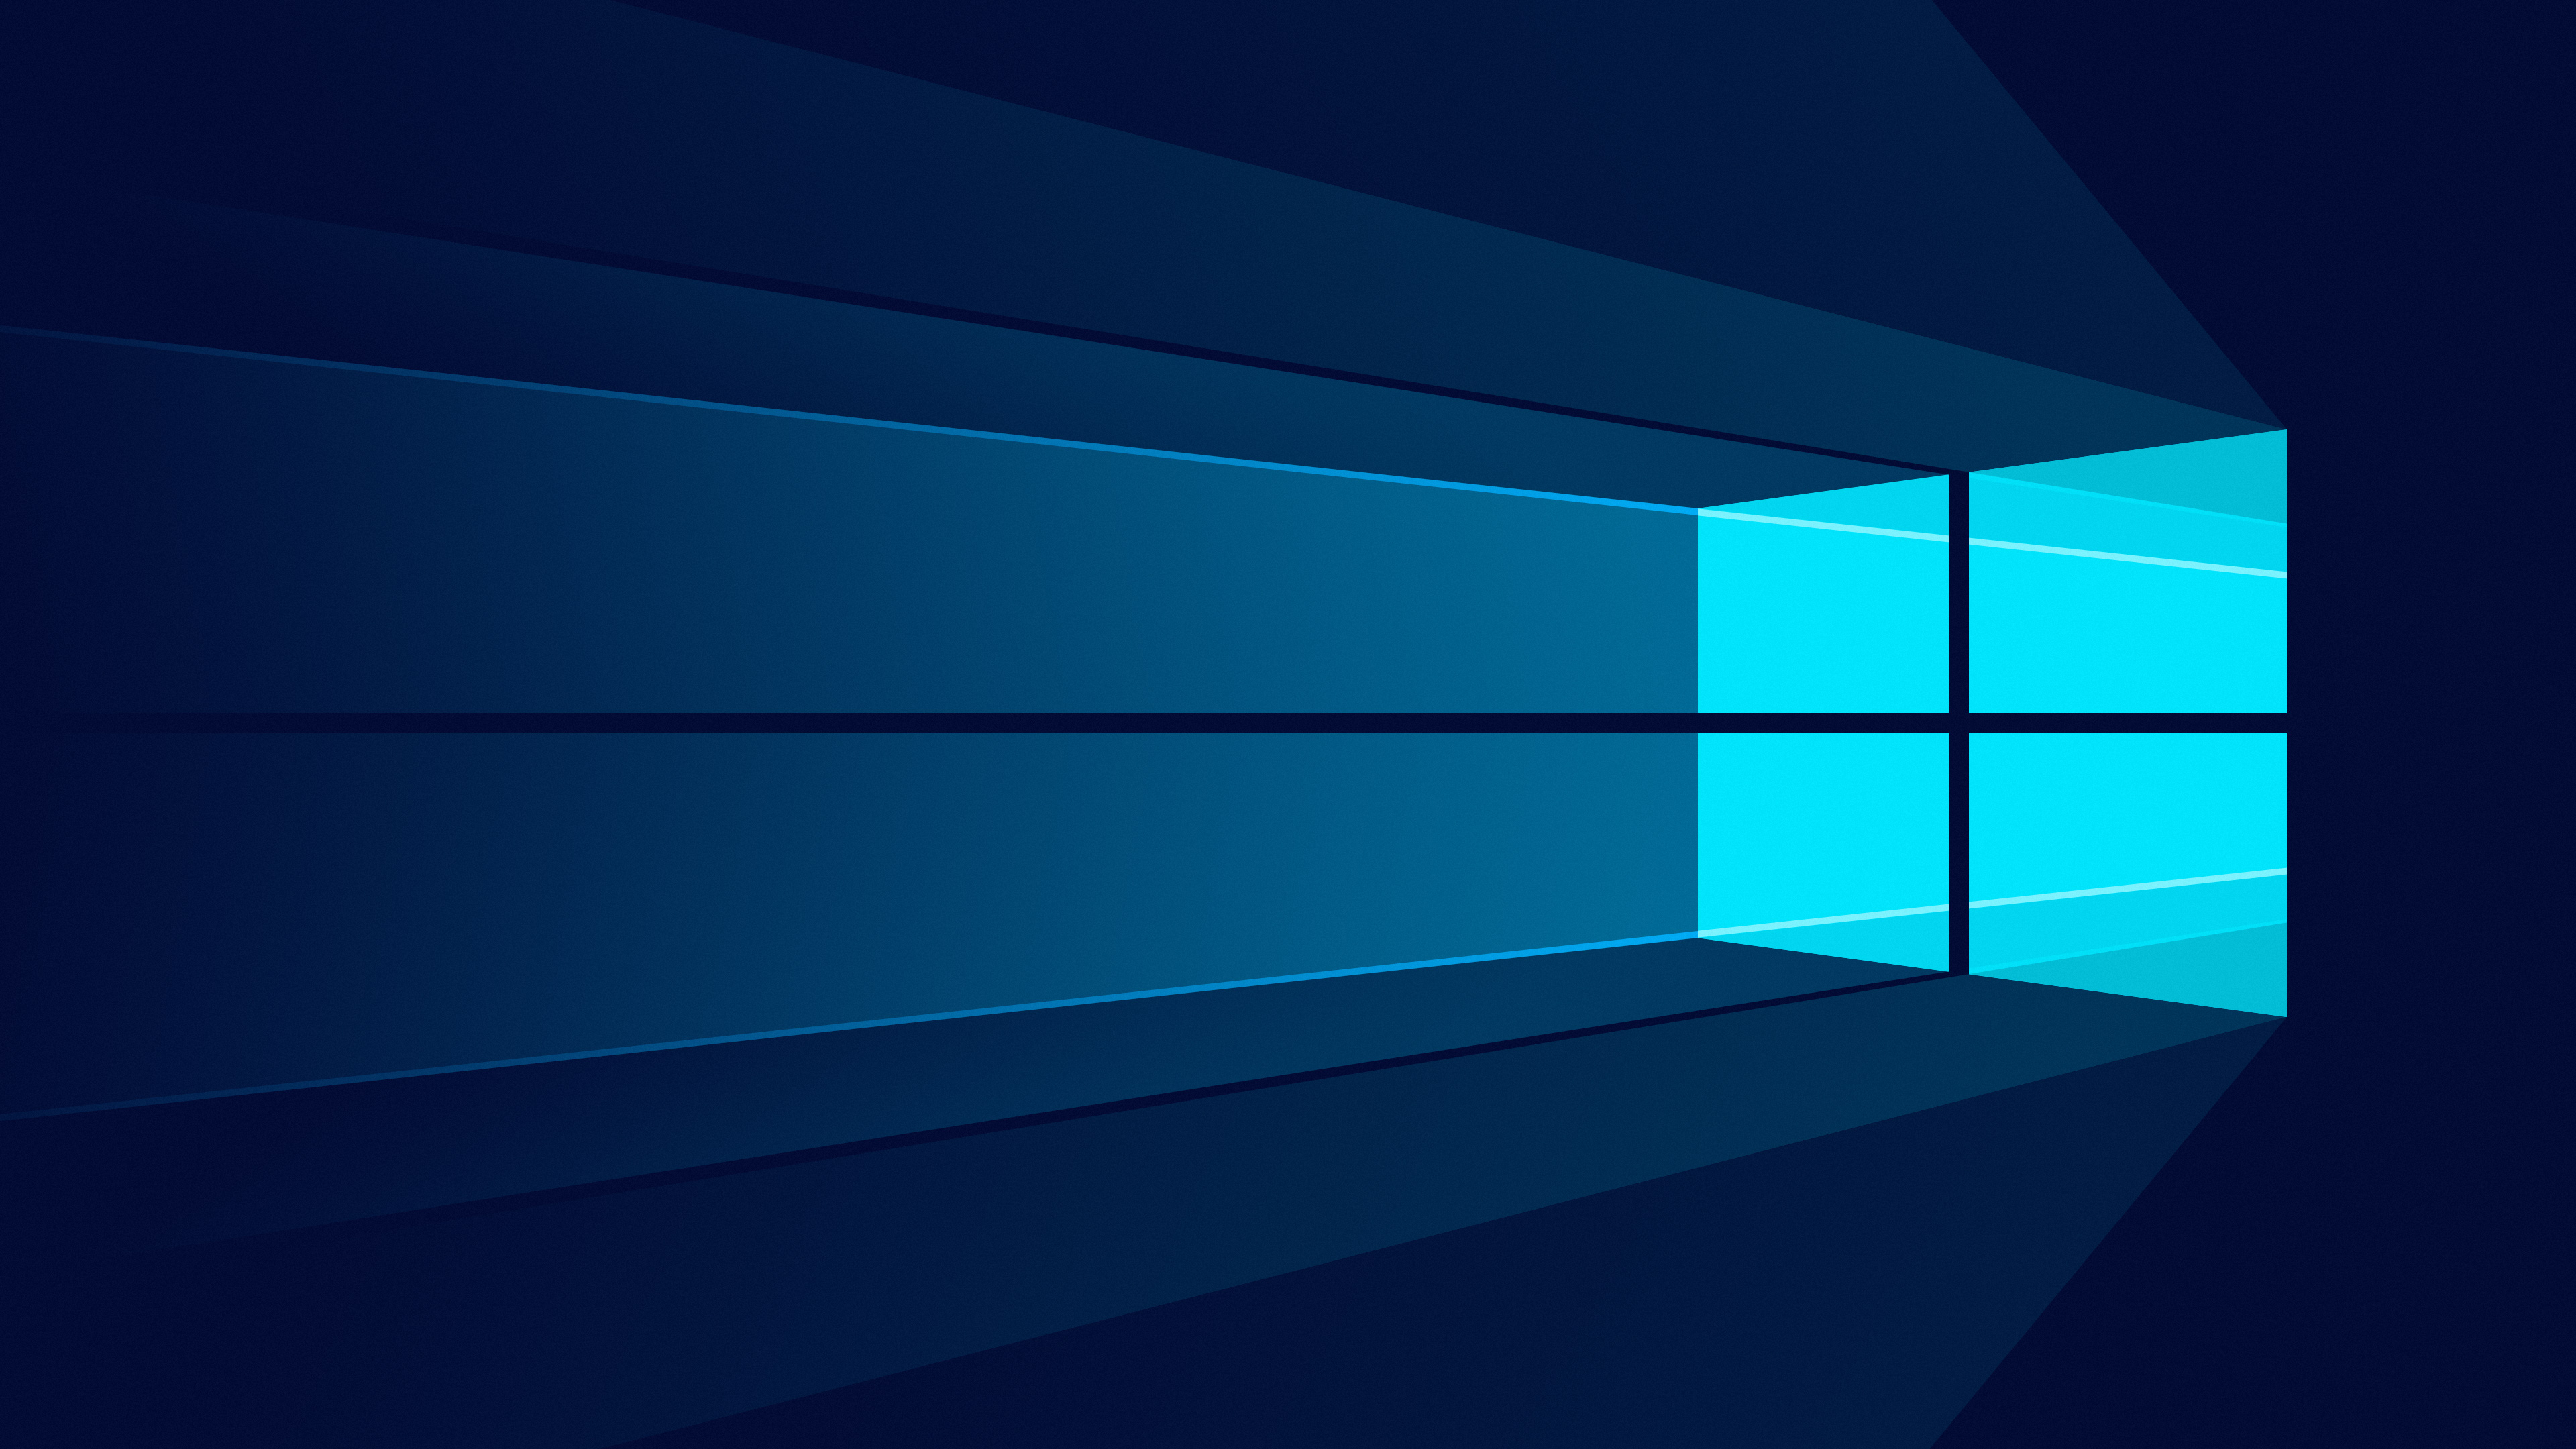 1608011506.6715windows-10-microsoft-windows-minimalist-blue-background-3840x2160-1557.jpg